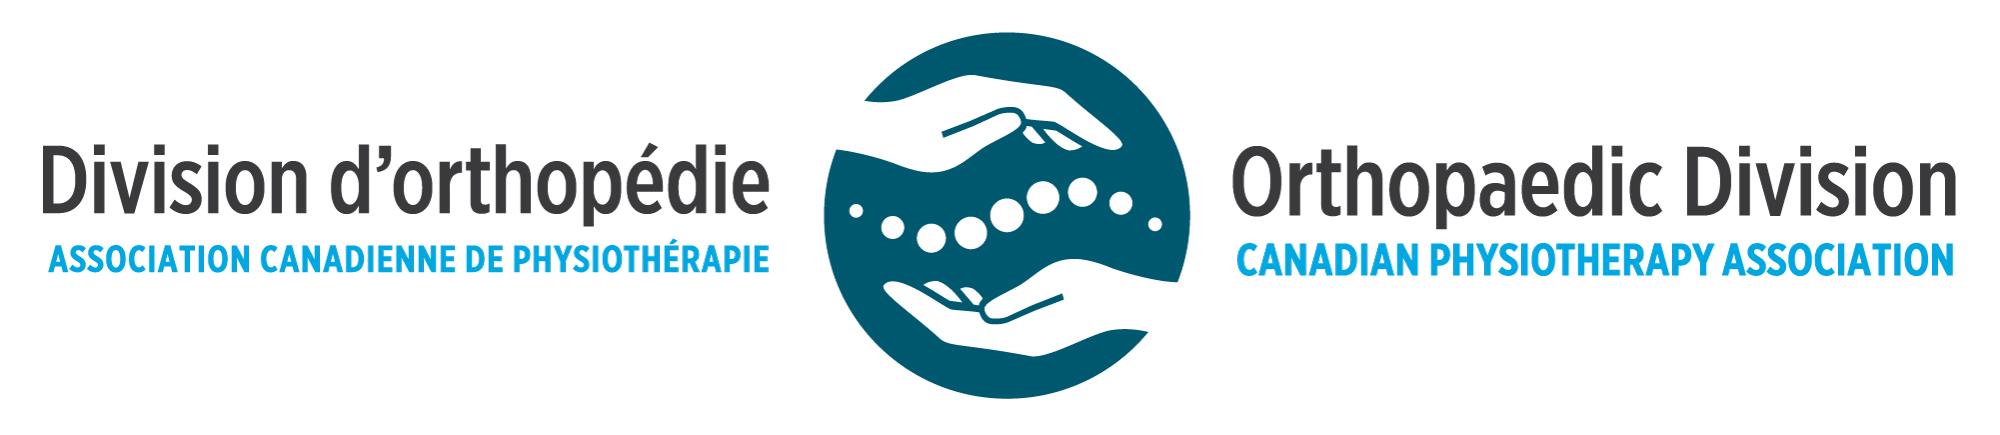 National Orthopaedic Division - https://www.orthodiv.org/